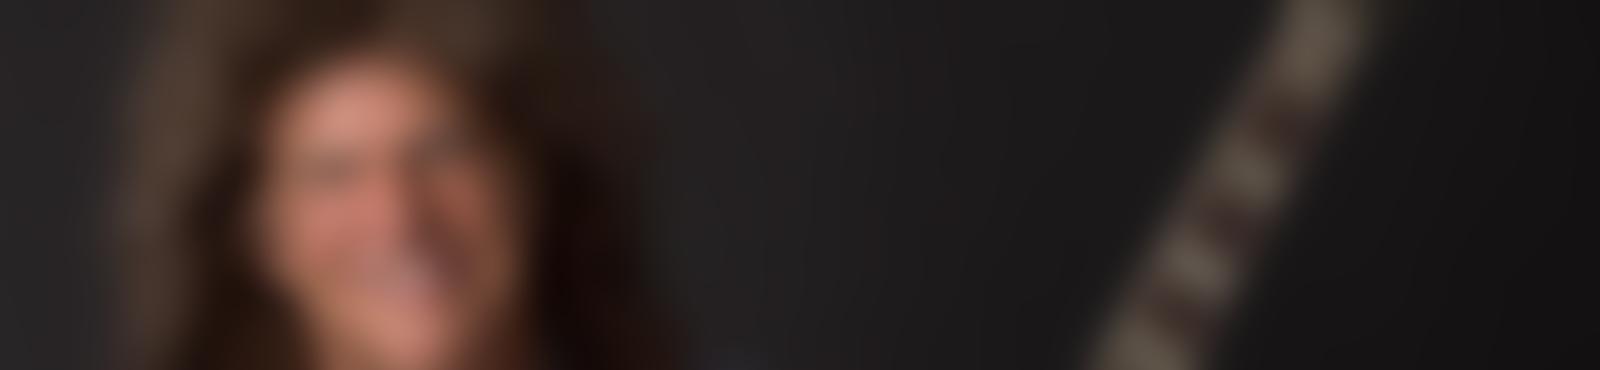 Blurred 8f2d5bfa f70e 4546 af24 e77f7583141d